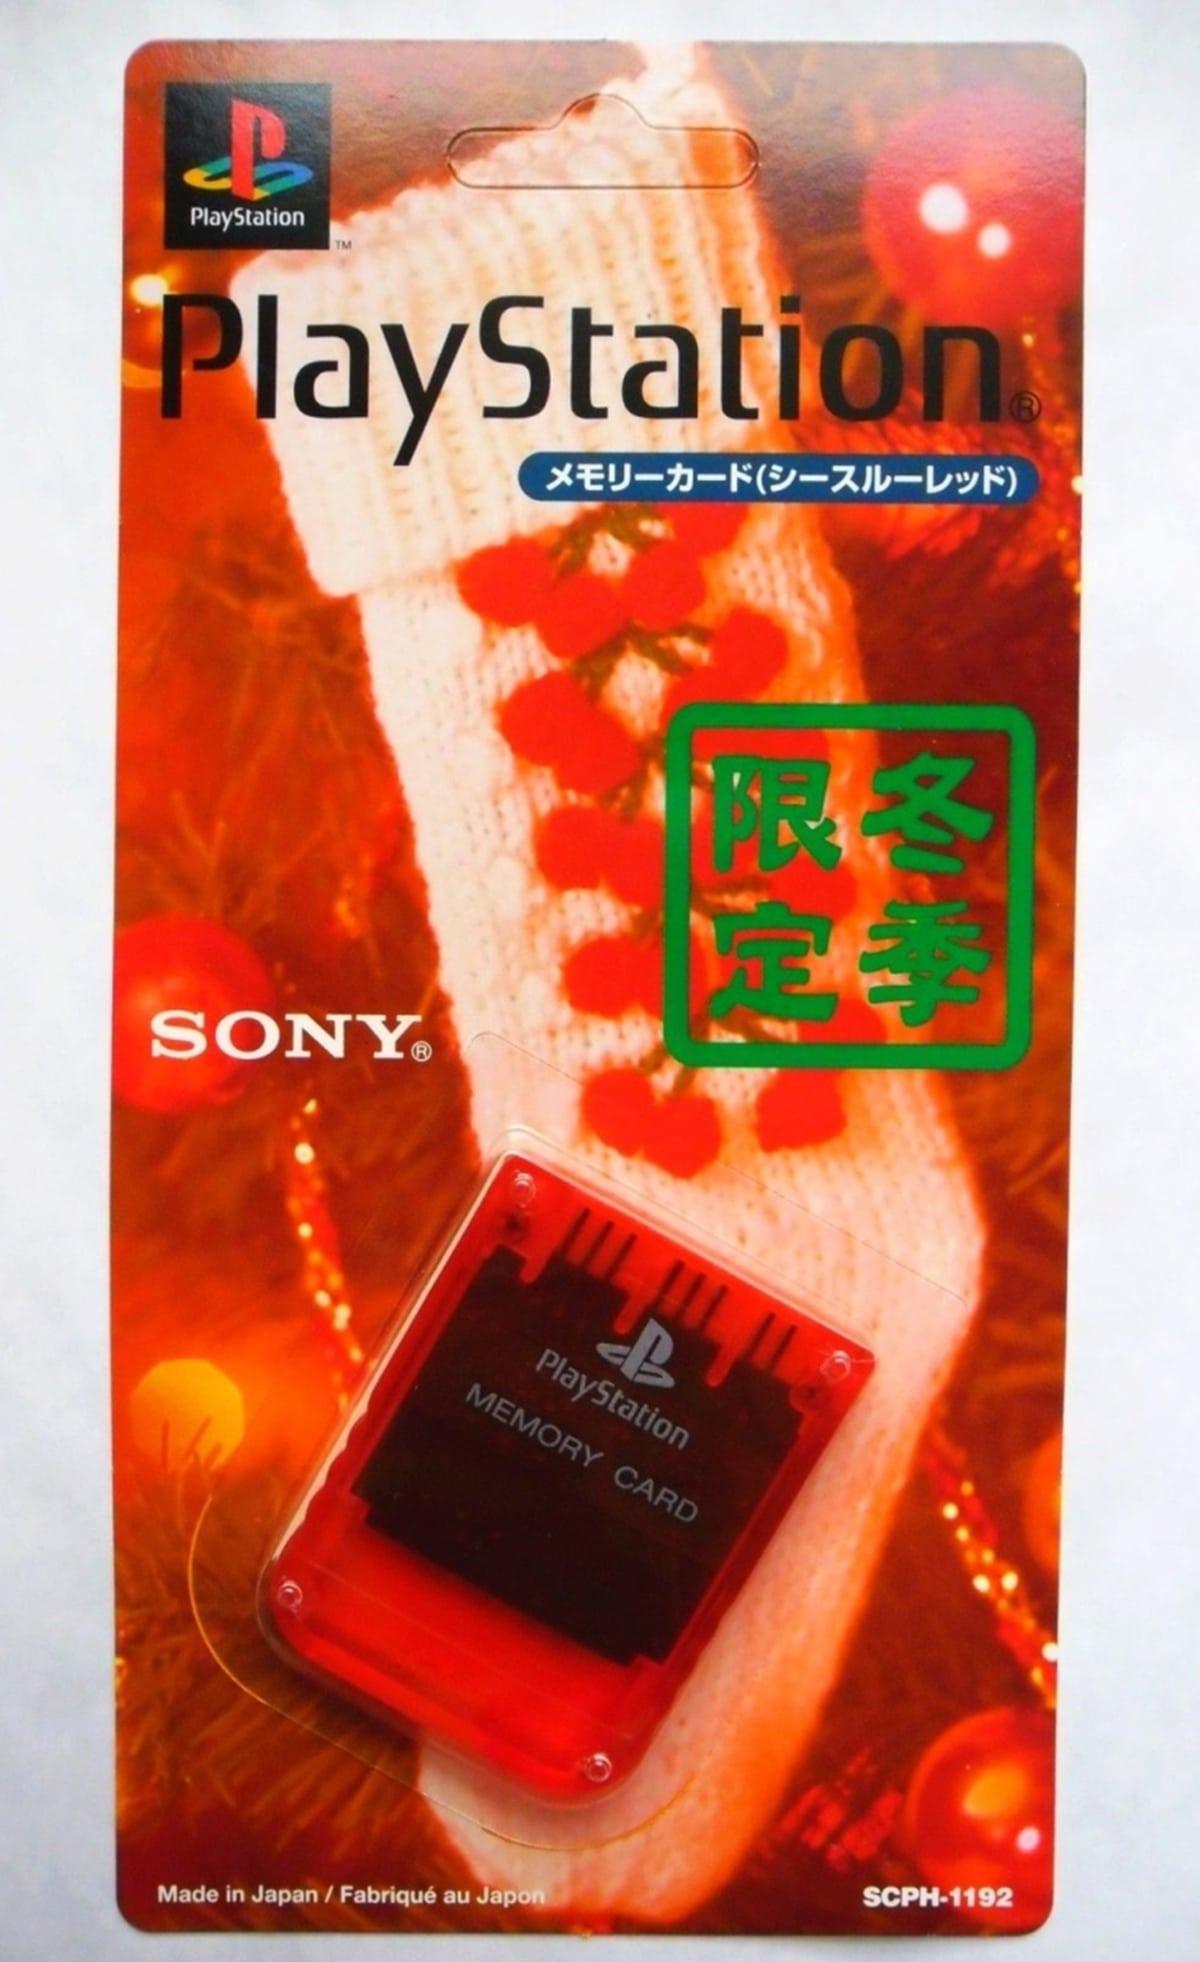 memory card scph 1092 051 - [SCPH-1020] Memory Card / Karta pamięci